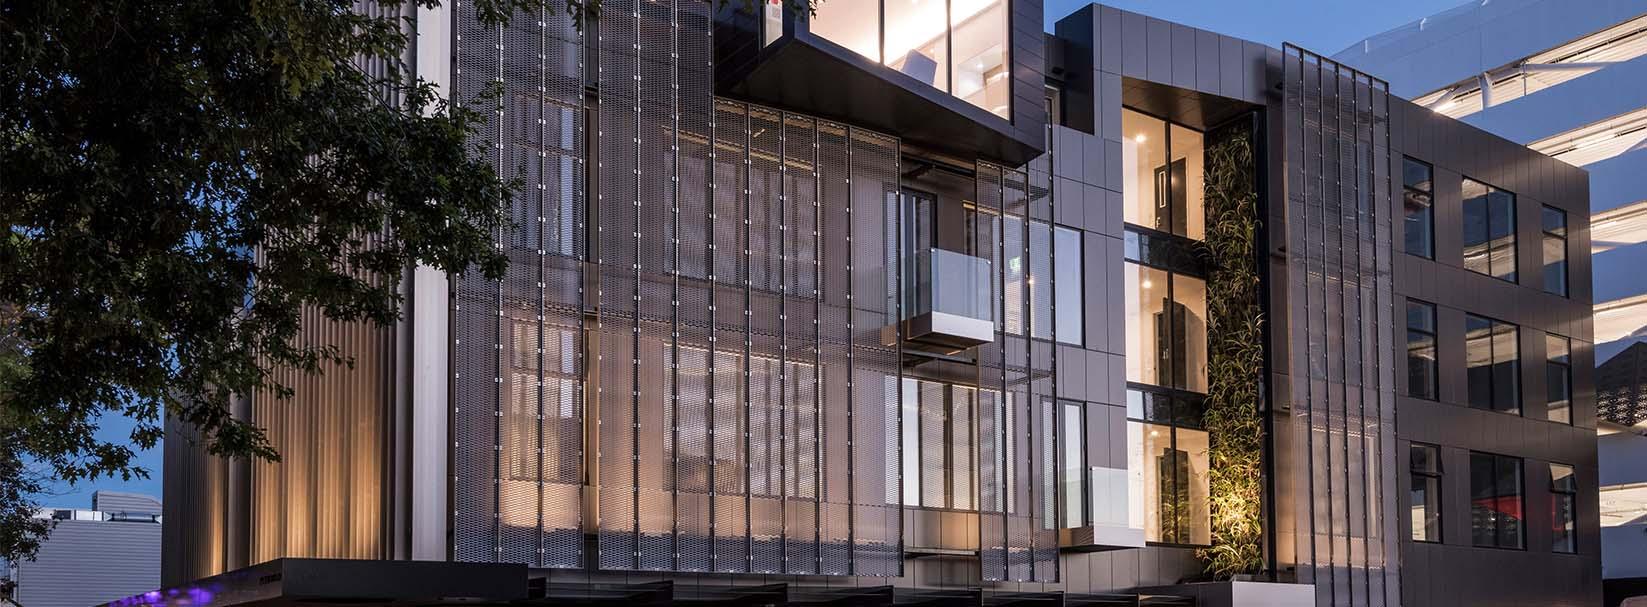 Businesses jostle for Christchurch CBD office space